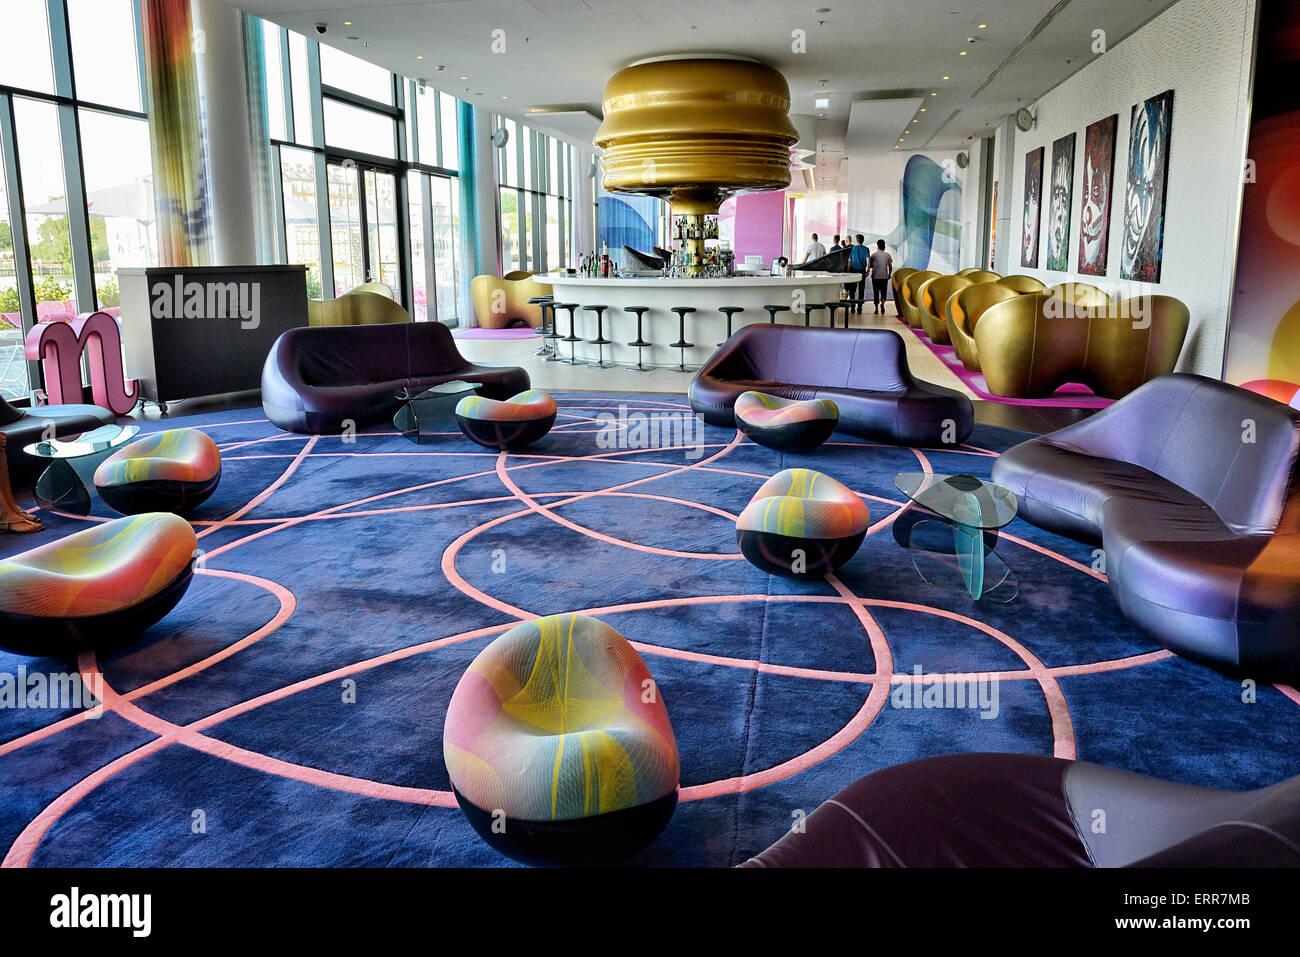 Alemania, Berlín, distrito Kreuzberg, Hotel Nhow, el lounge bar. Imagen De Stock